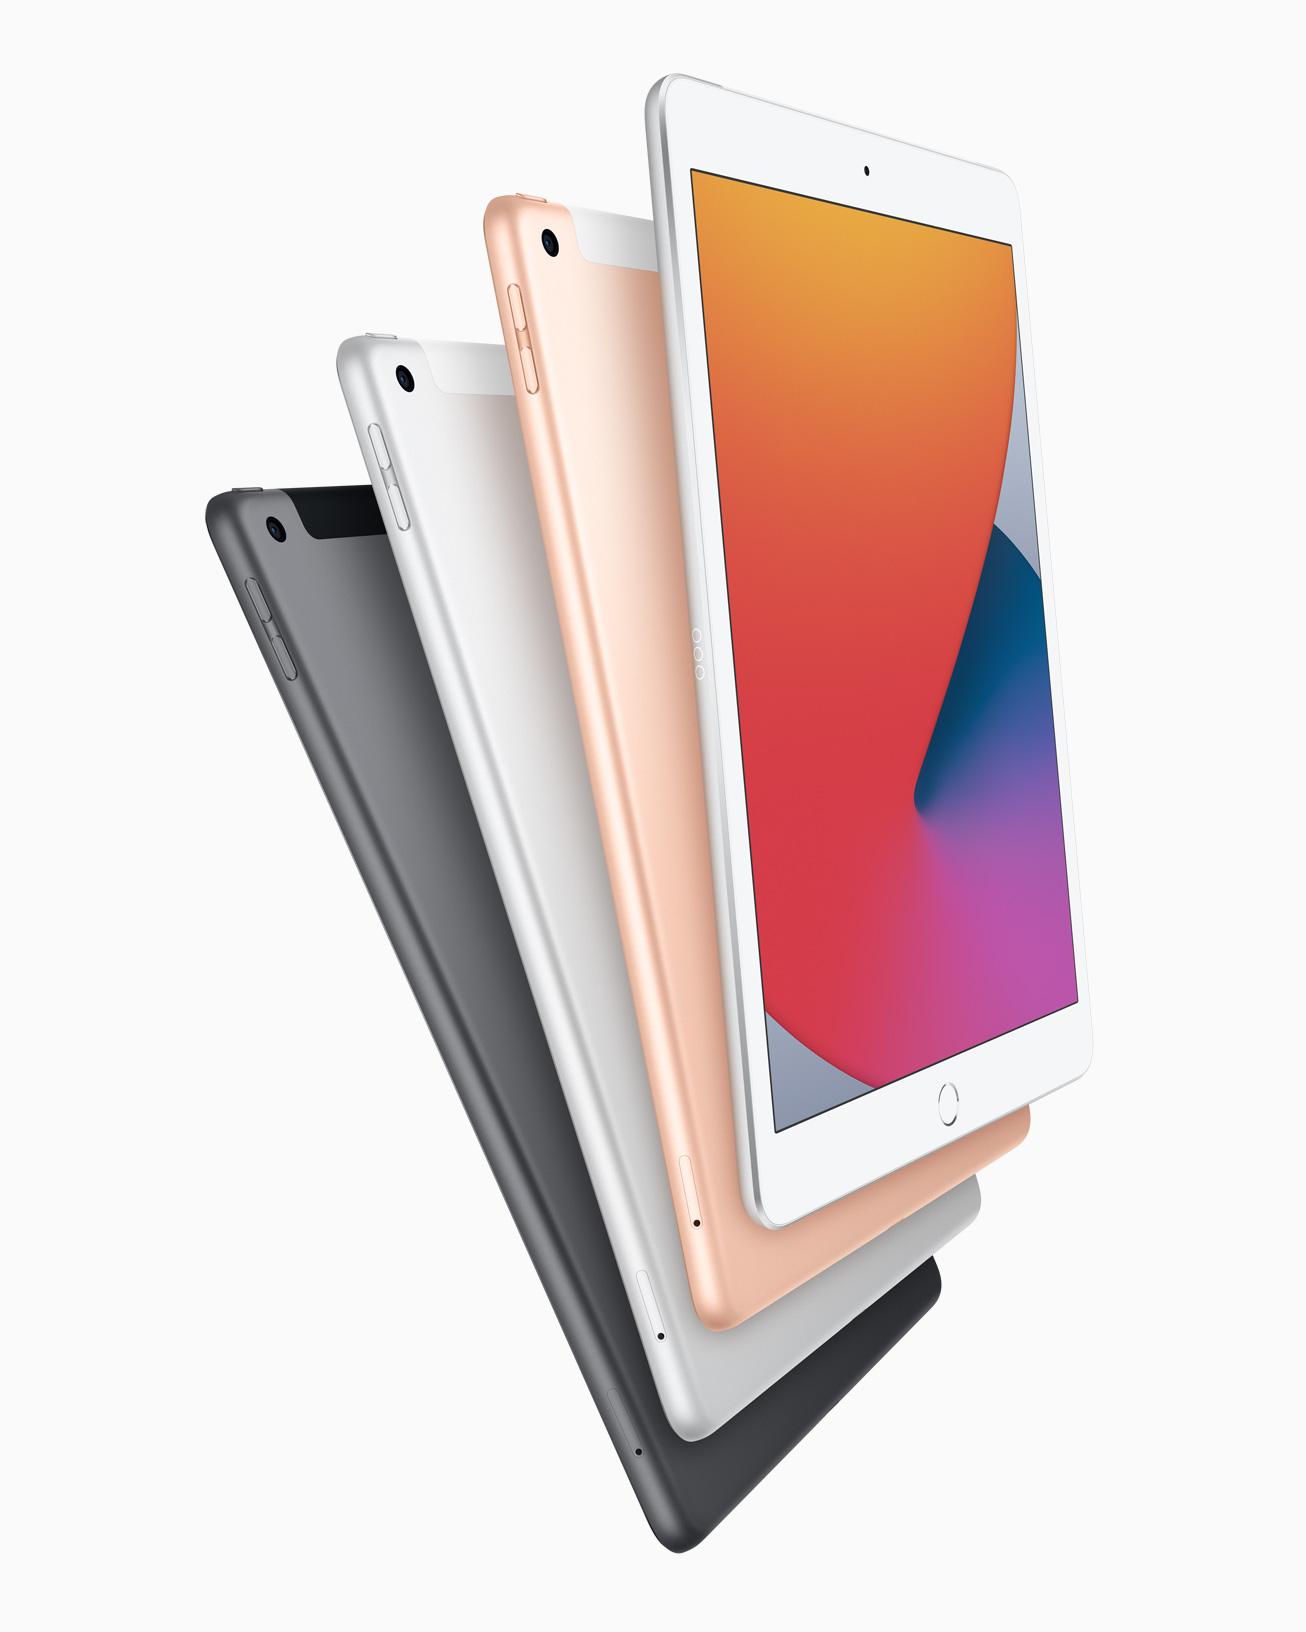 apple ipad-8th-gen colors 09152020 inline.jpg.large 2x